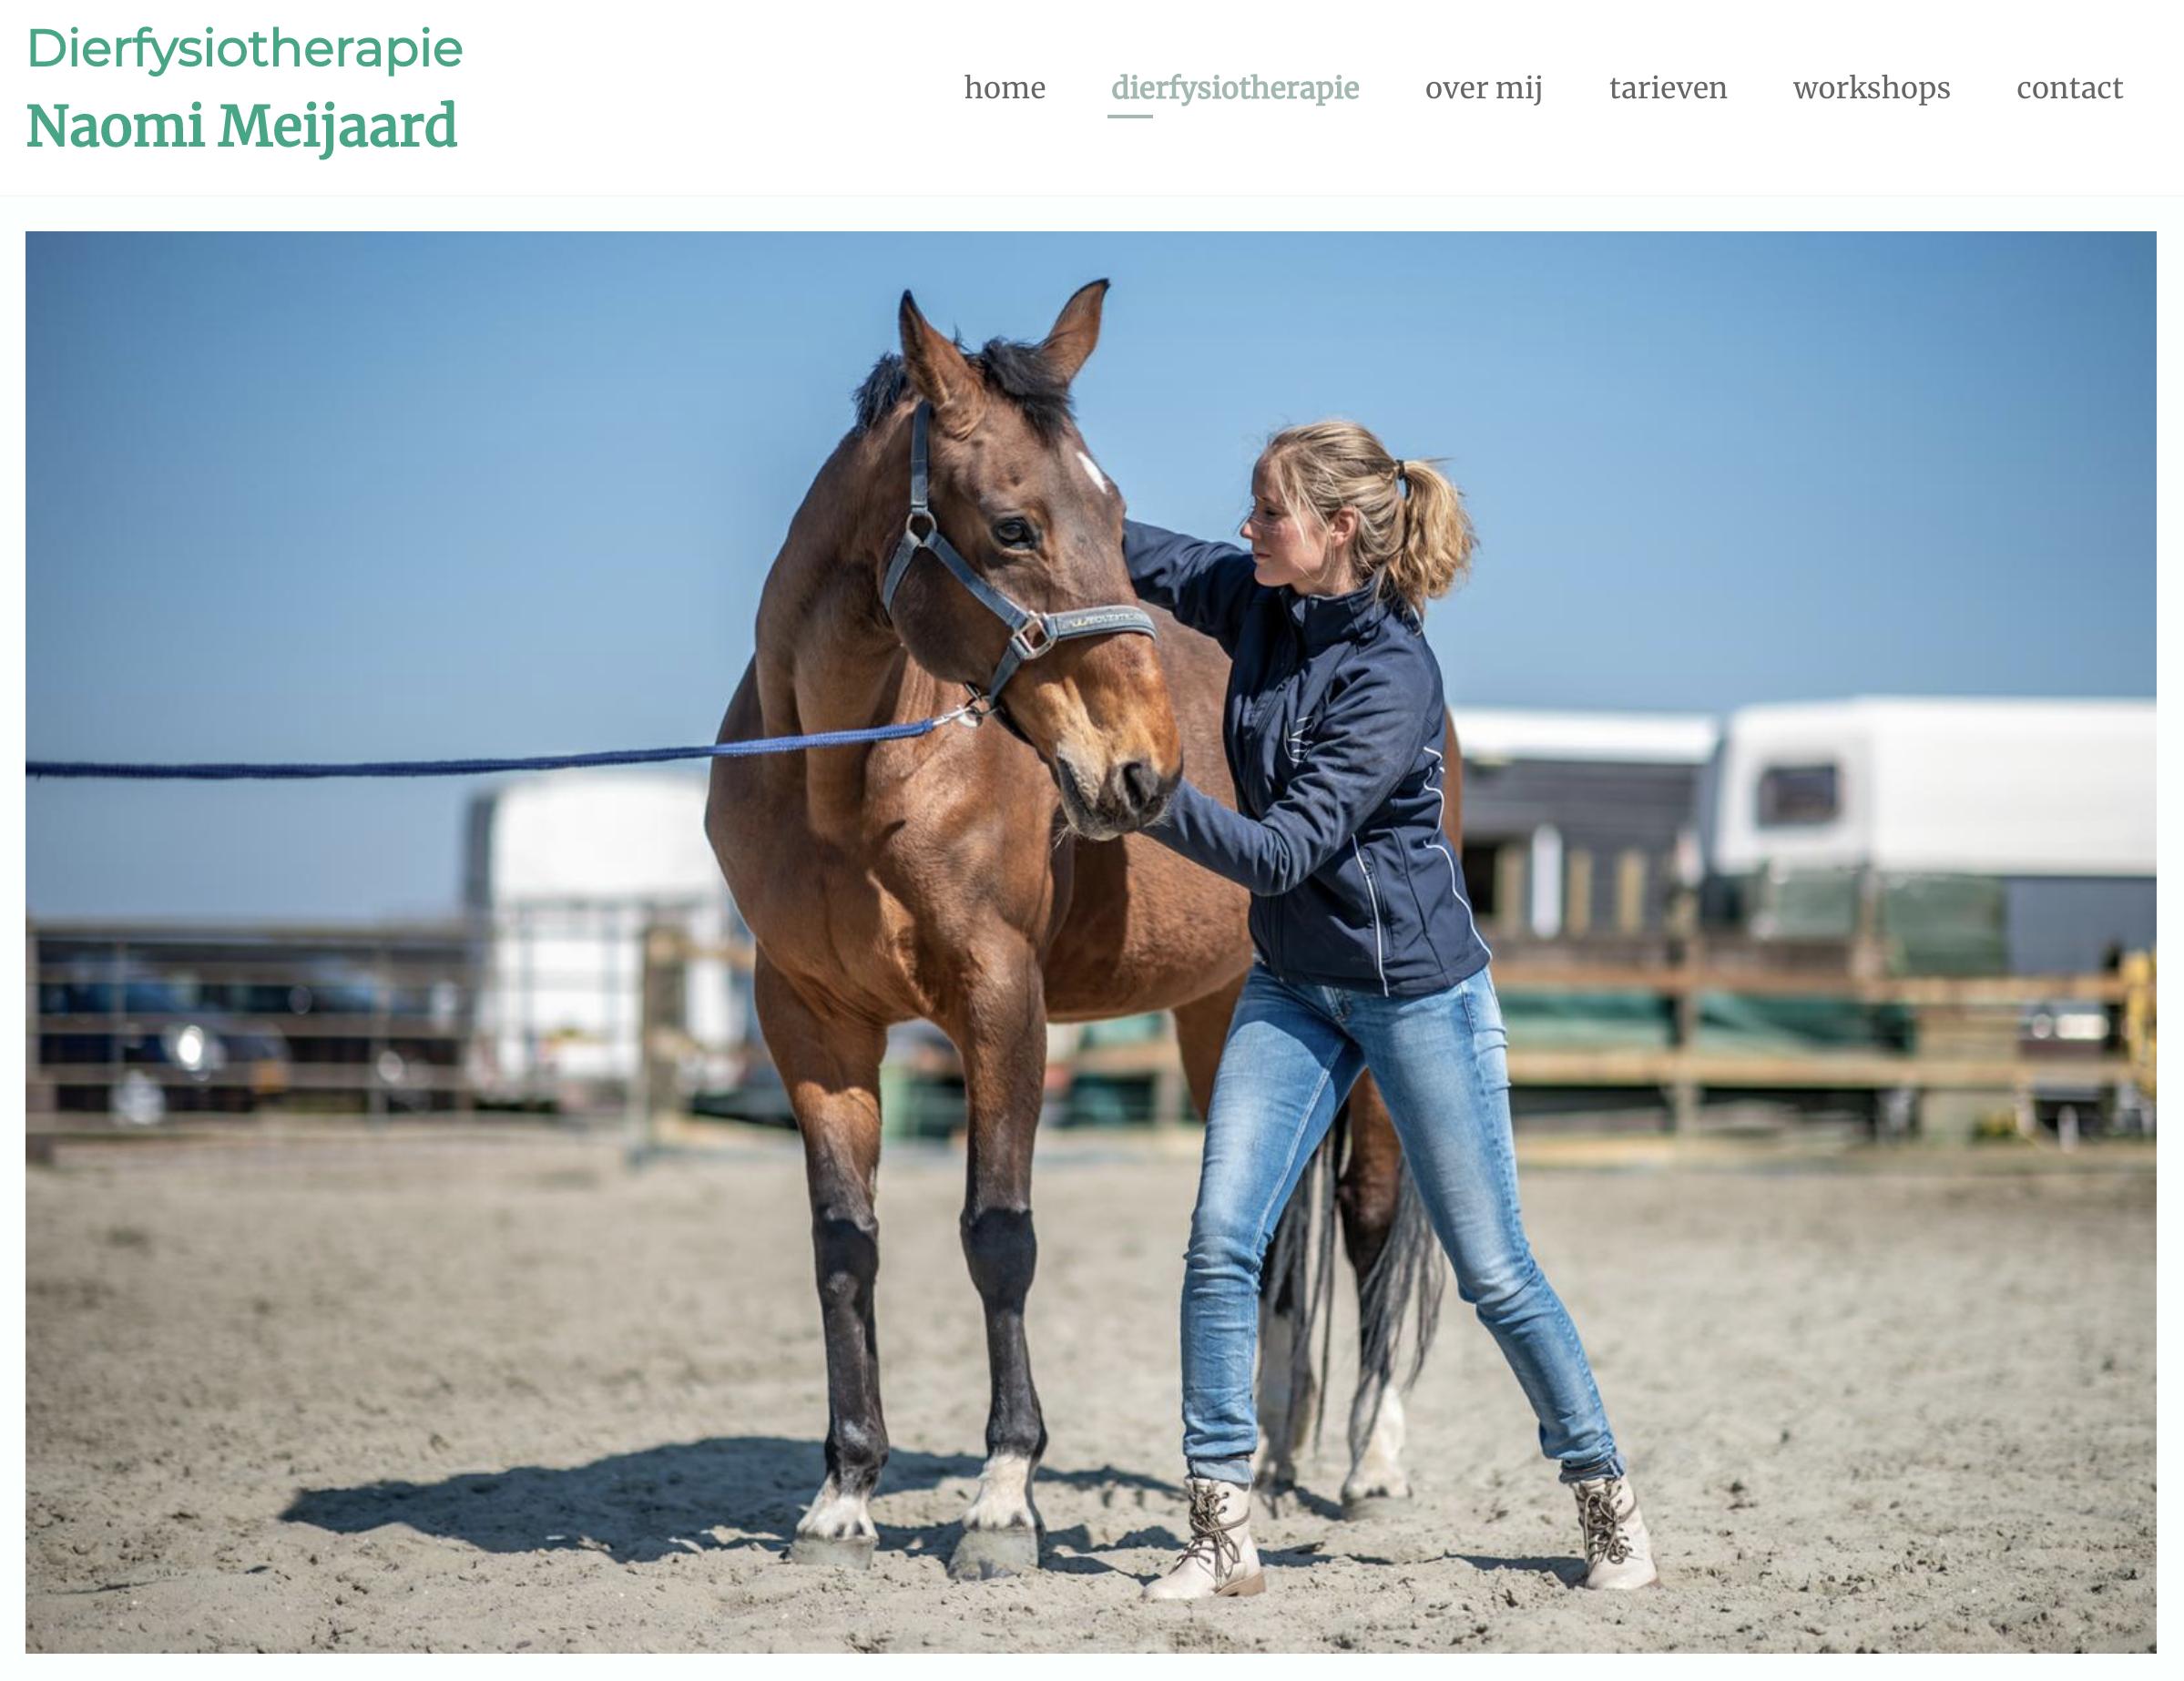 Fotografie dierenfysiotherapie naomi meijaard